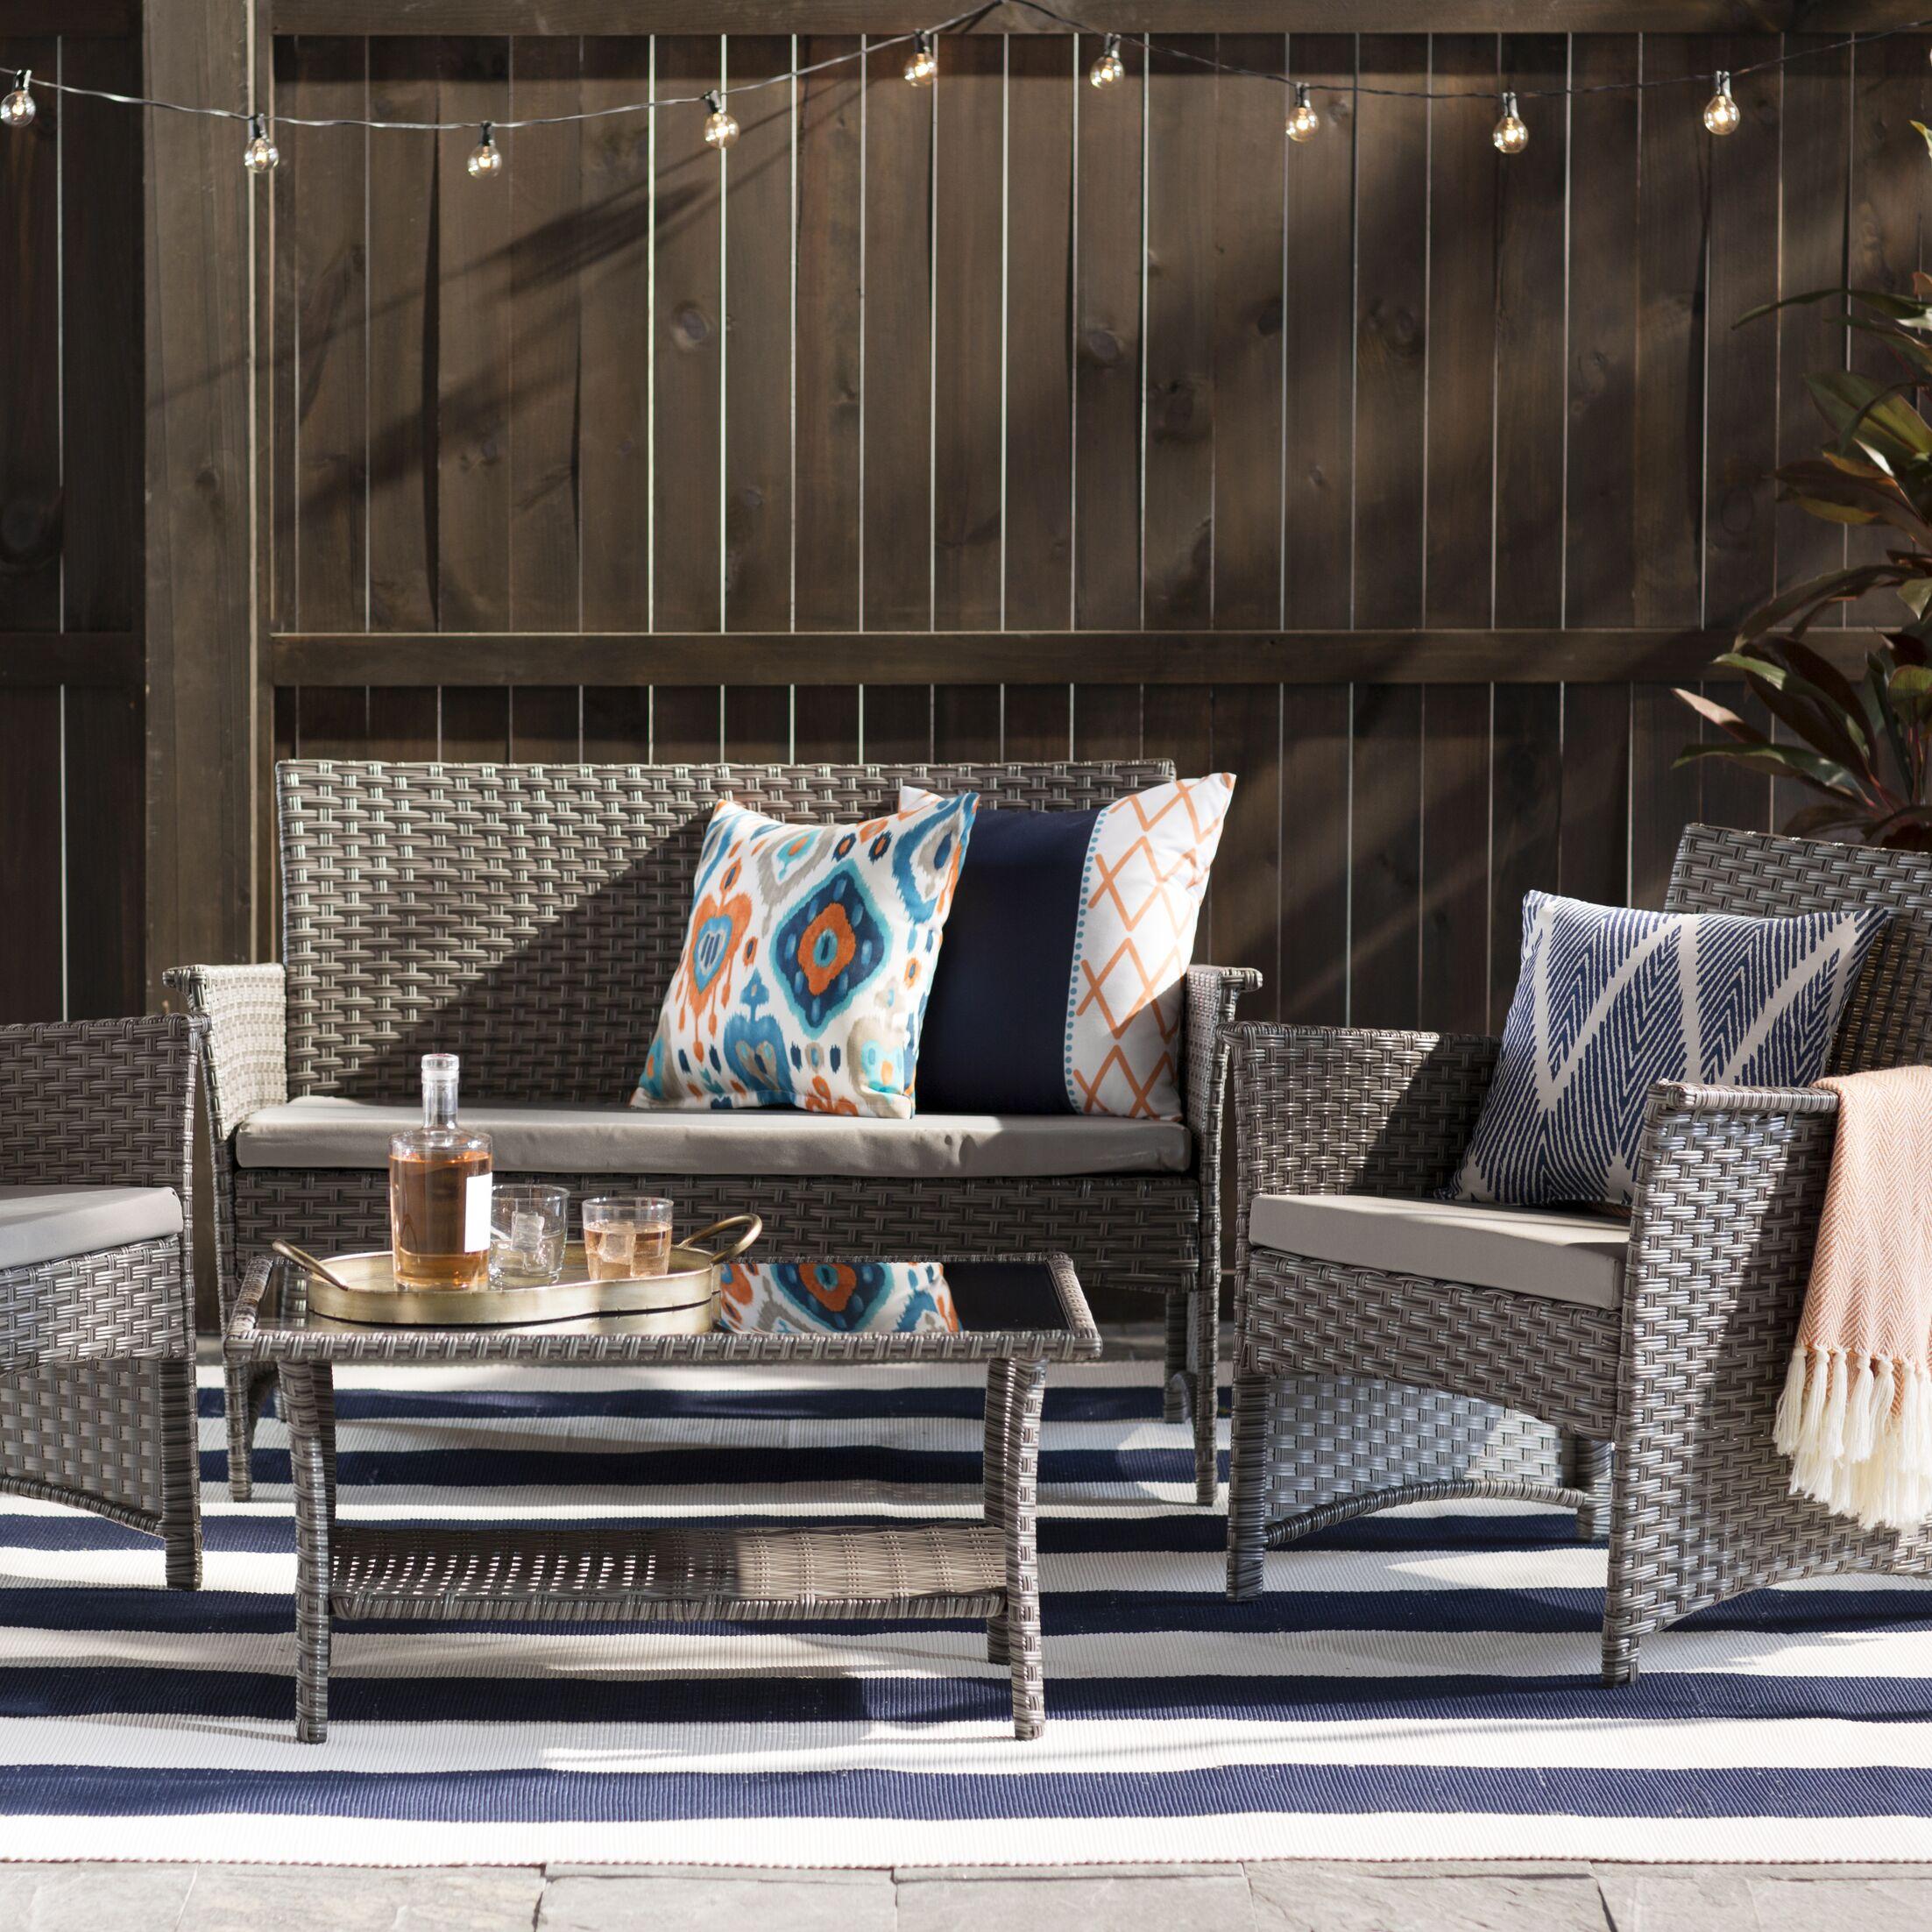 Barnhart 4 Piece Sofa Set with Cushions Color: Gray